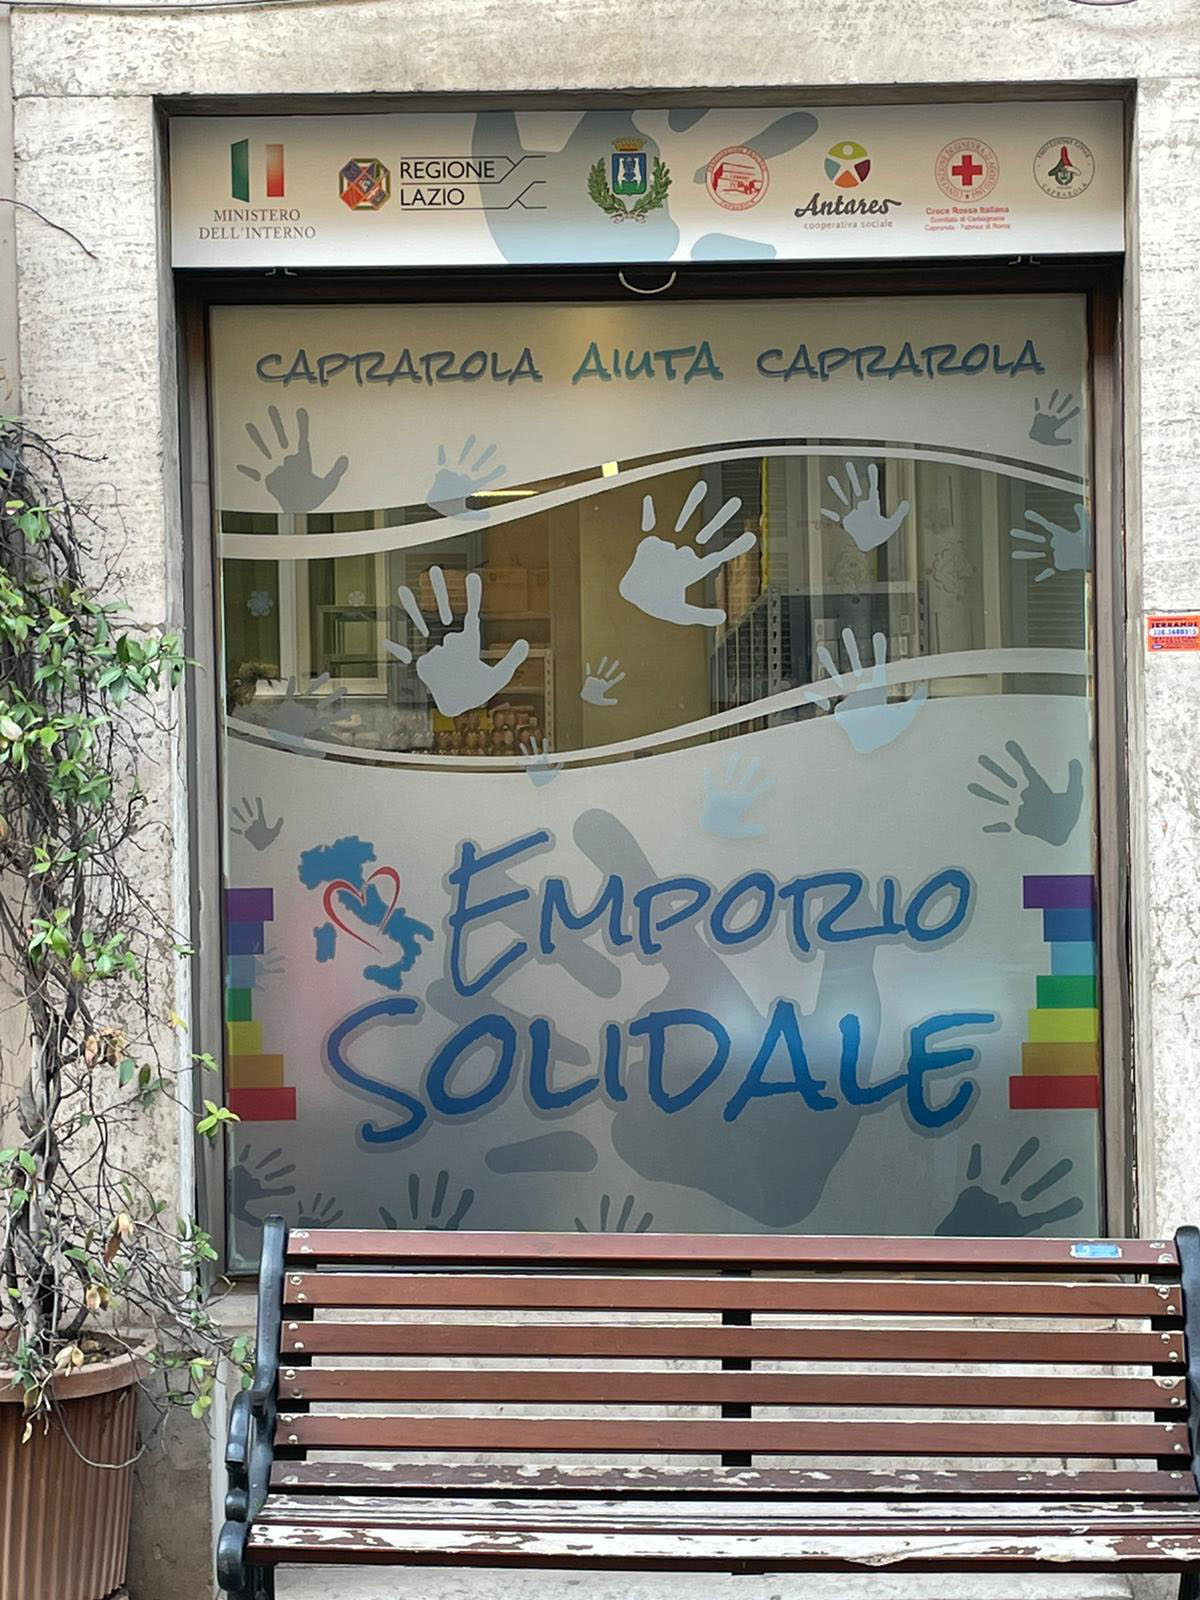 CAPRAROLA, APRONO EMPORIO SOLIDALE E PUNTO D'ASCOLTO